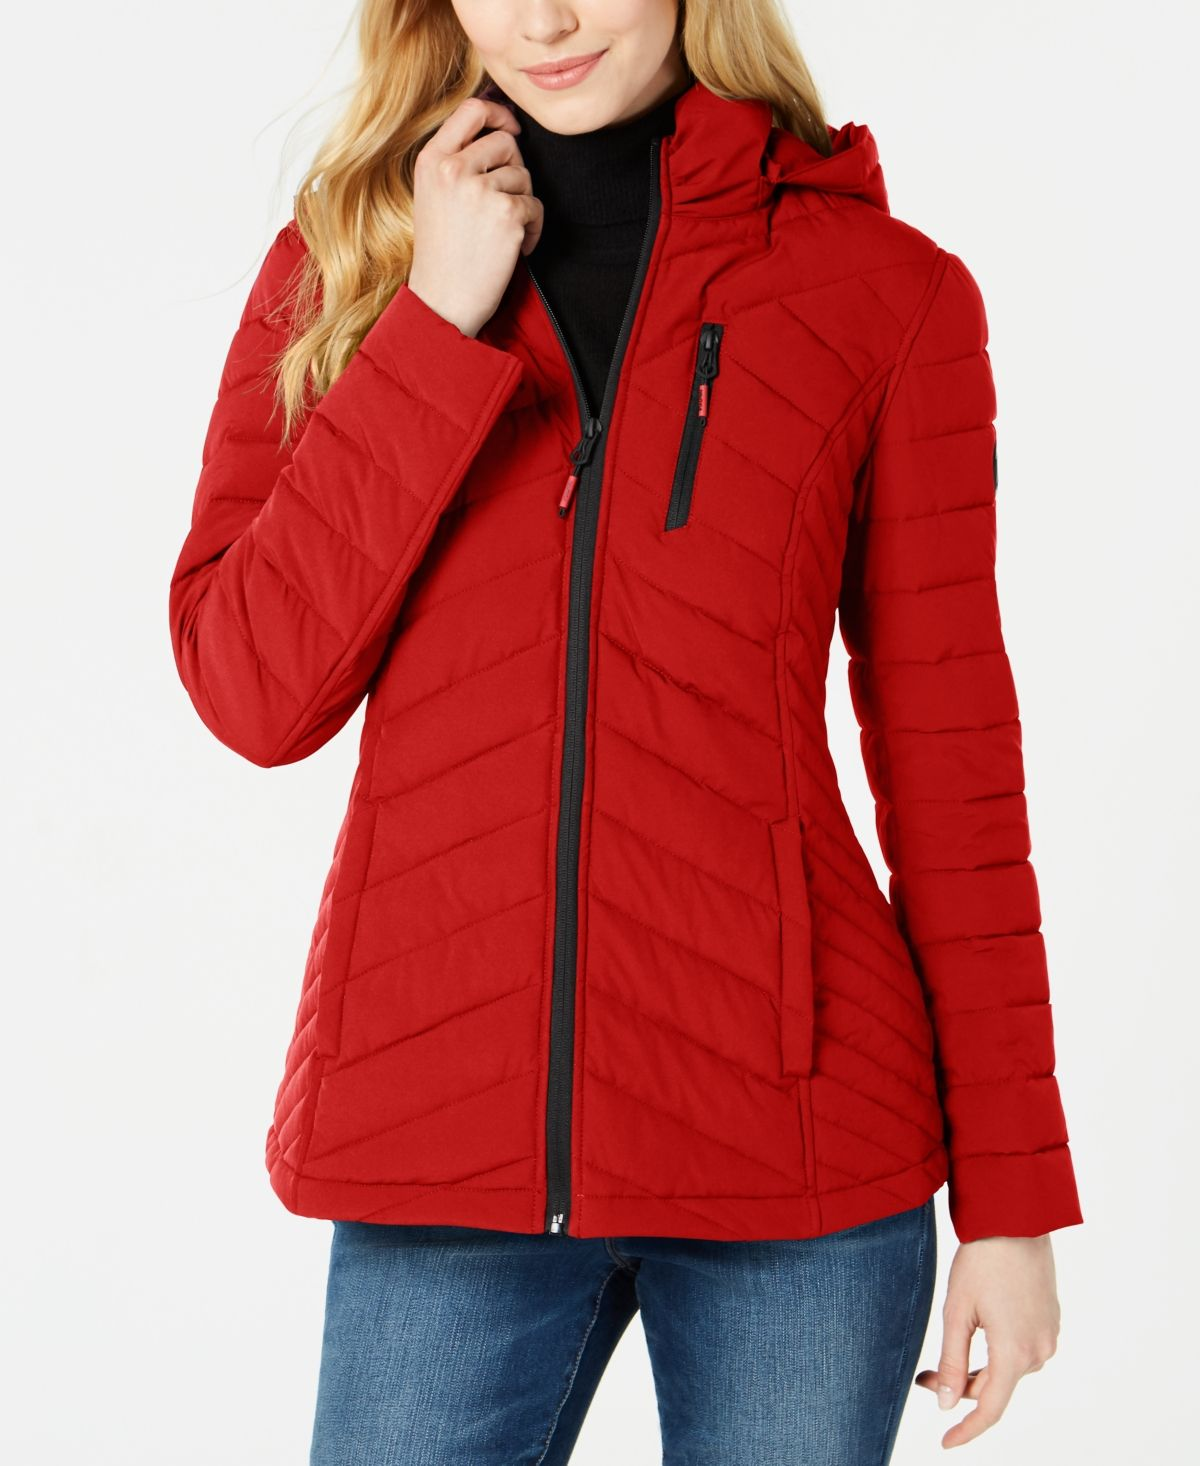 Nautica Hooded Packable Puffer Coat Nautica Red Coats For Women Red Puffer Jacket Puffer Coat [ 1466 x 1200 Pixel ]